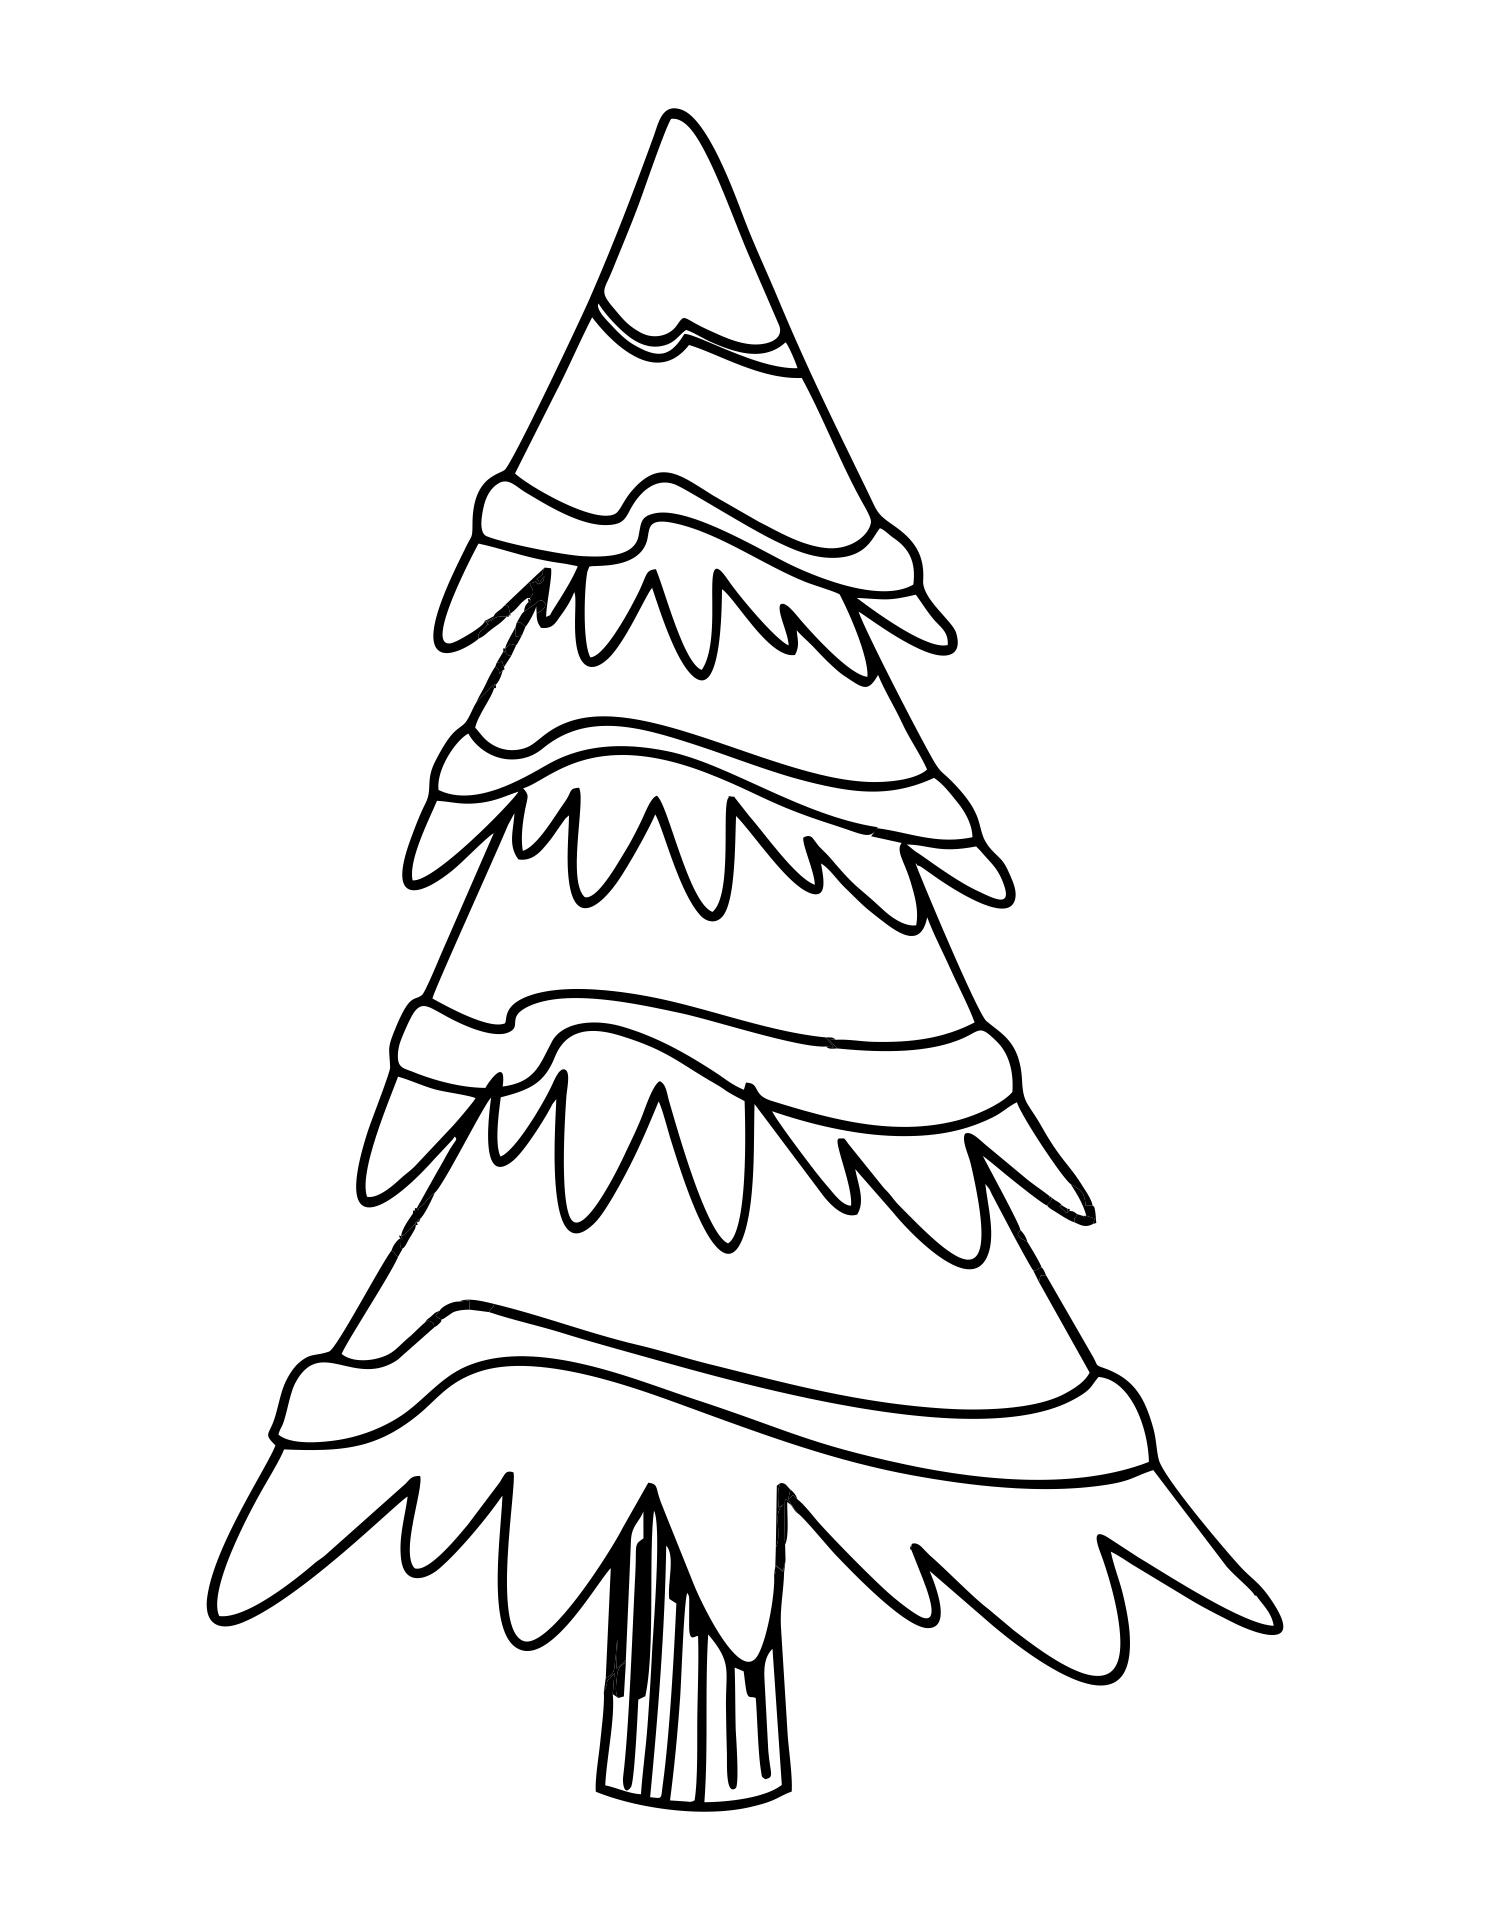 5 Best Images of Printable Blank Christmas Tree ...